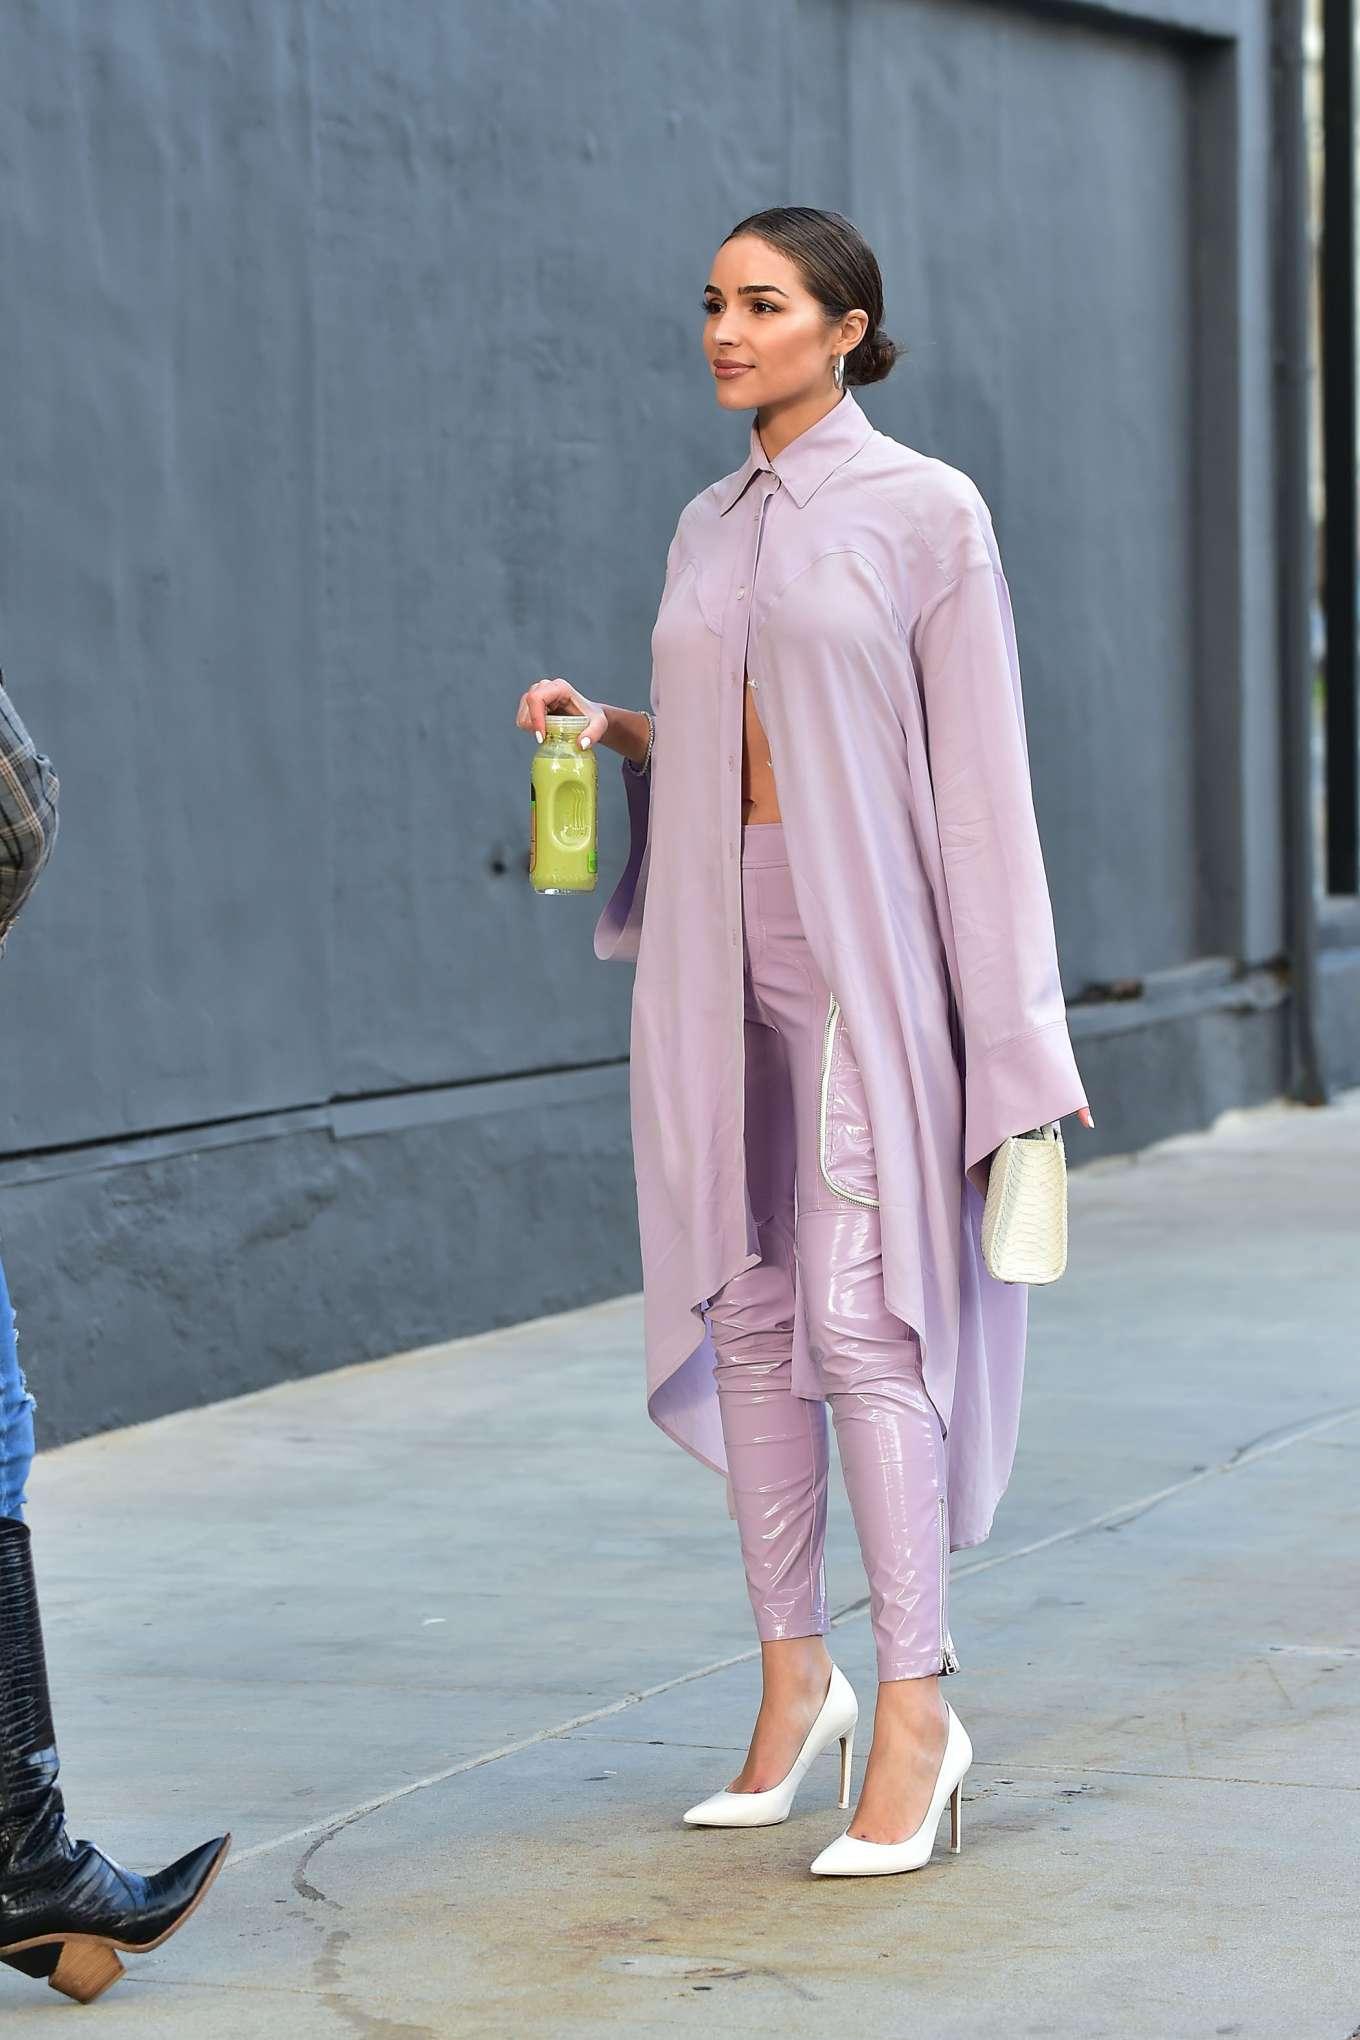 Olivia Culpo donning Shiny mauve skinny pants